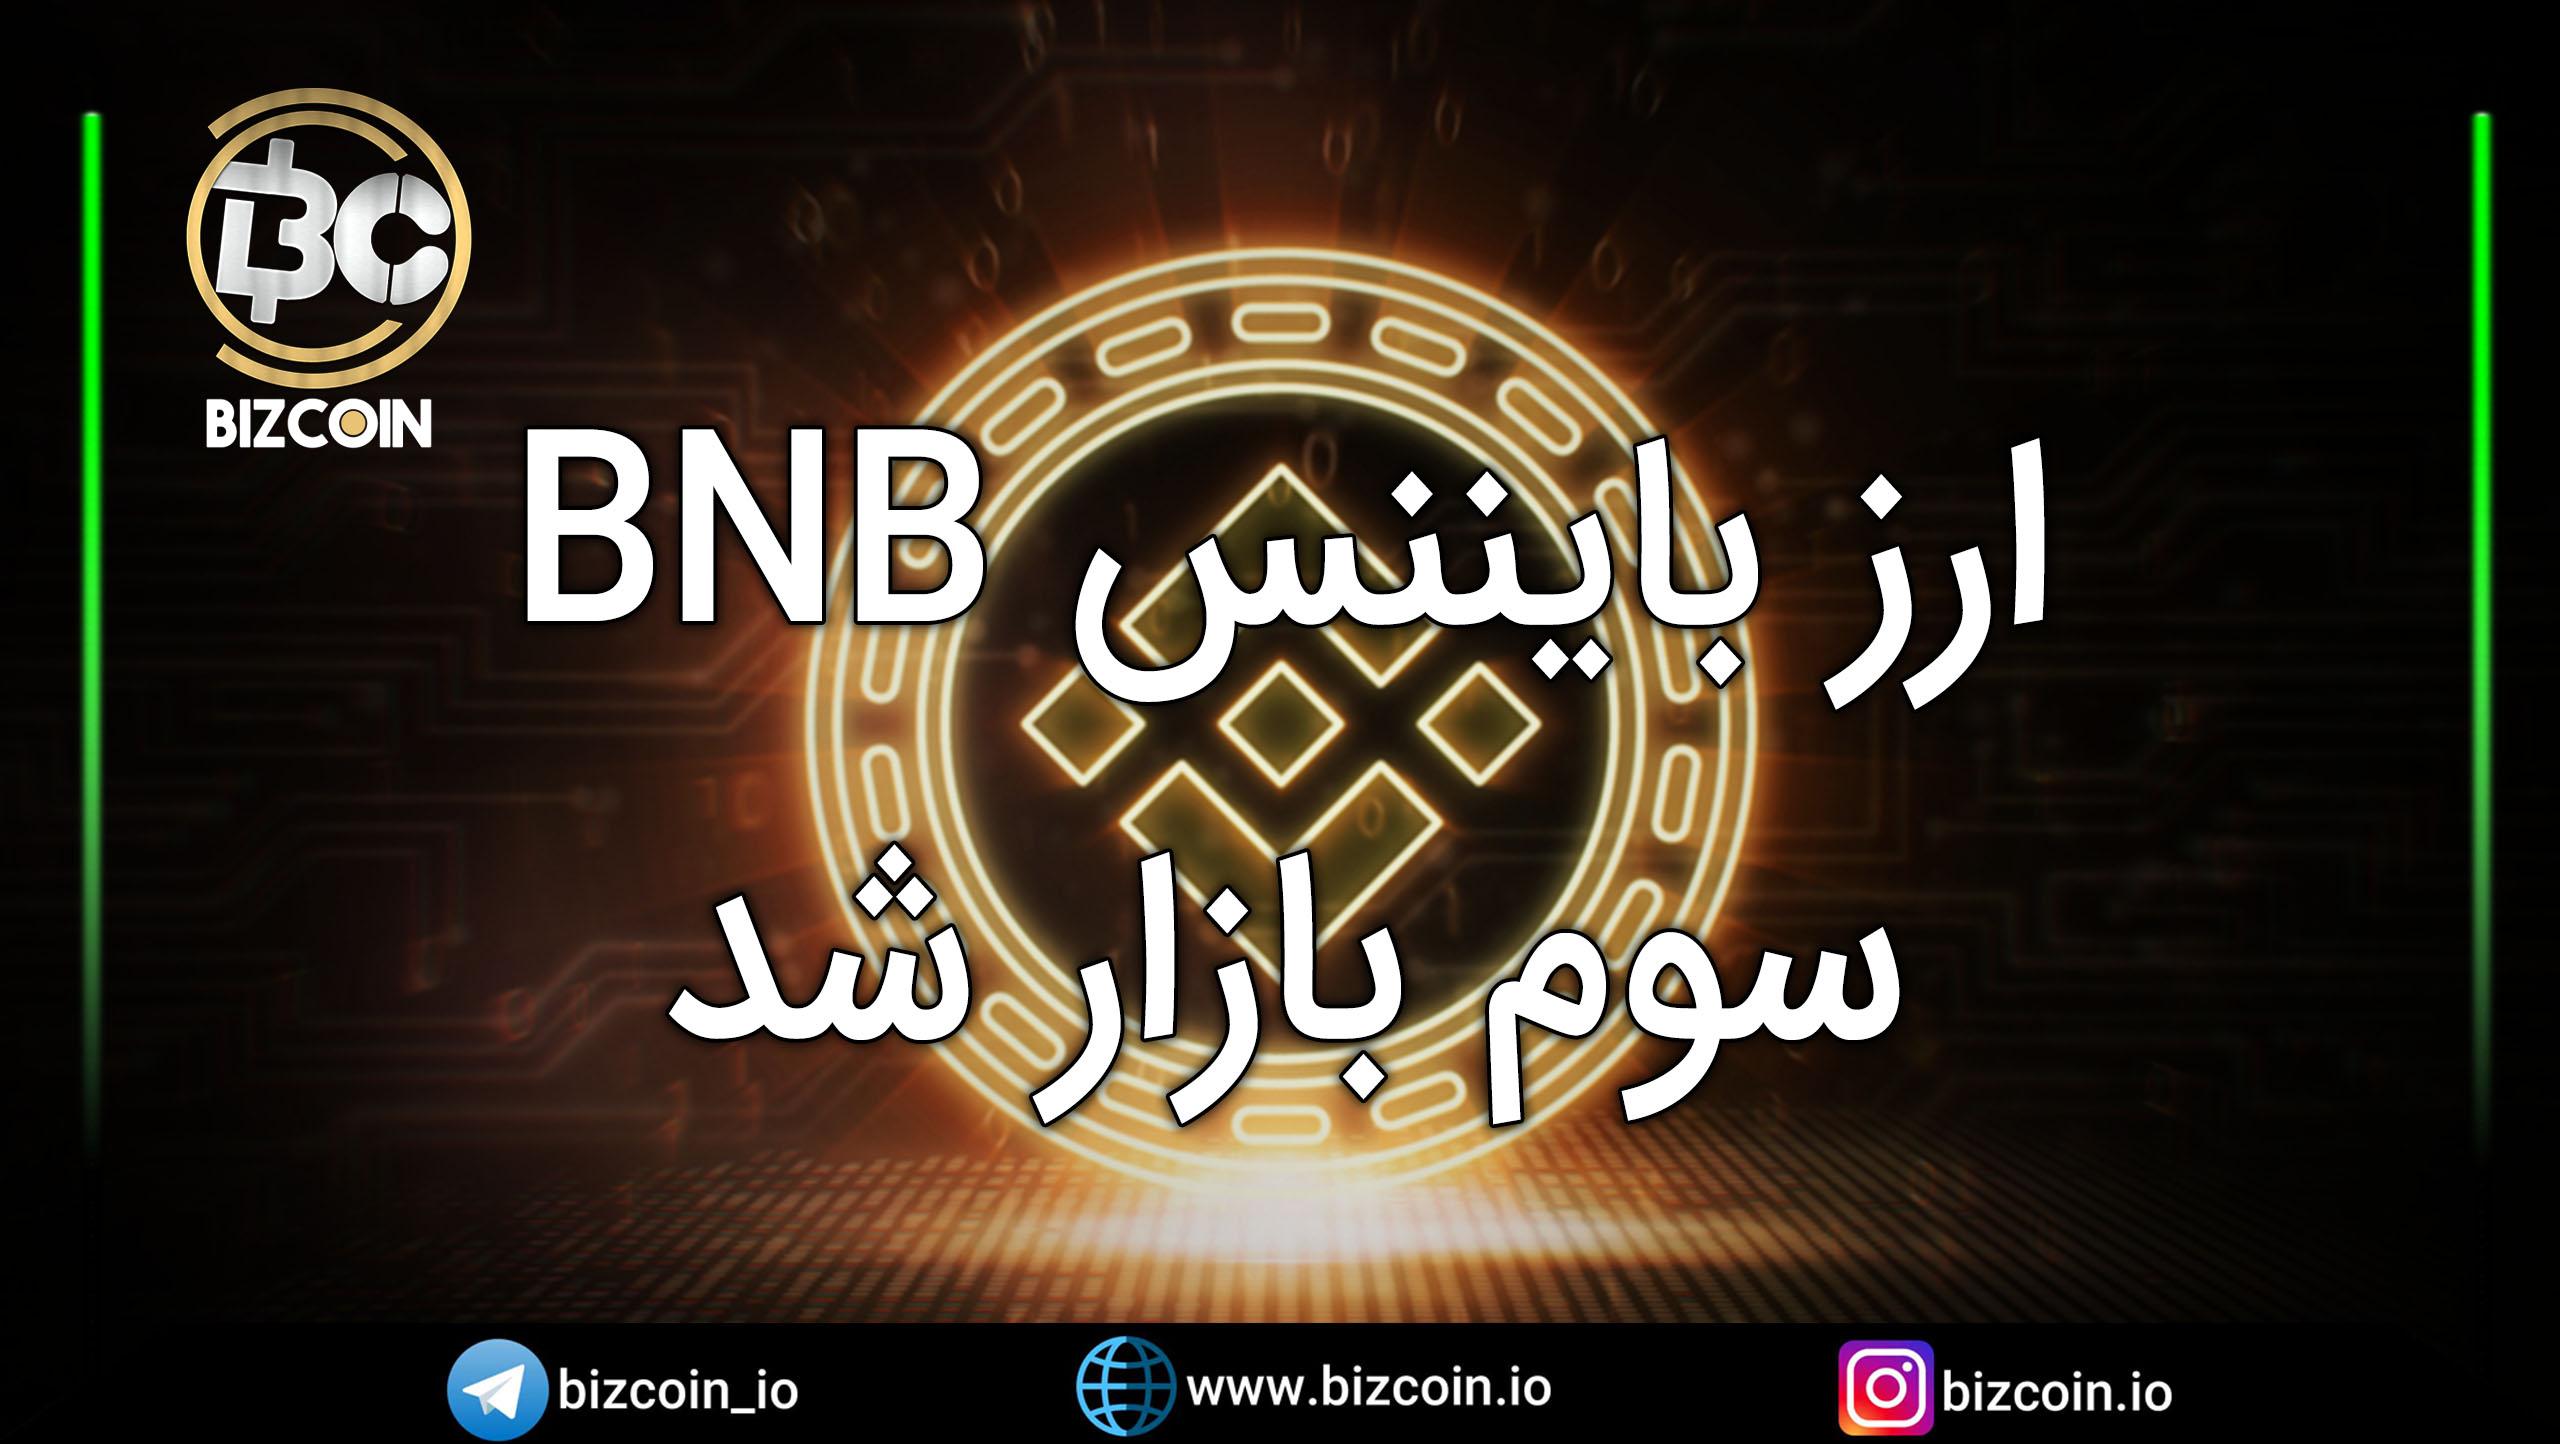 BNB currency became the third market ارز بایننس BNB سوم بازار شد